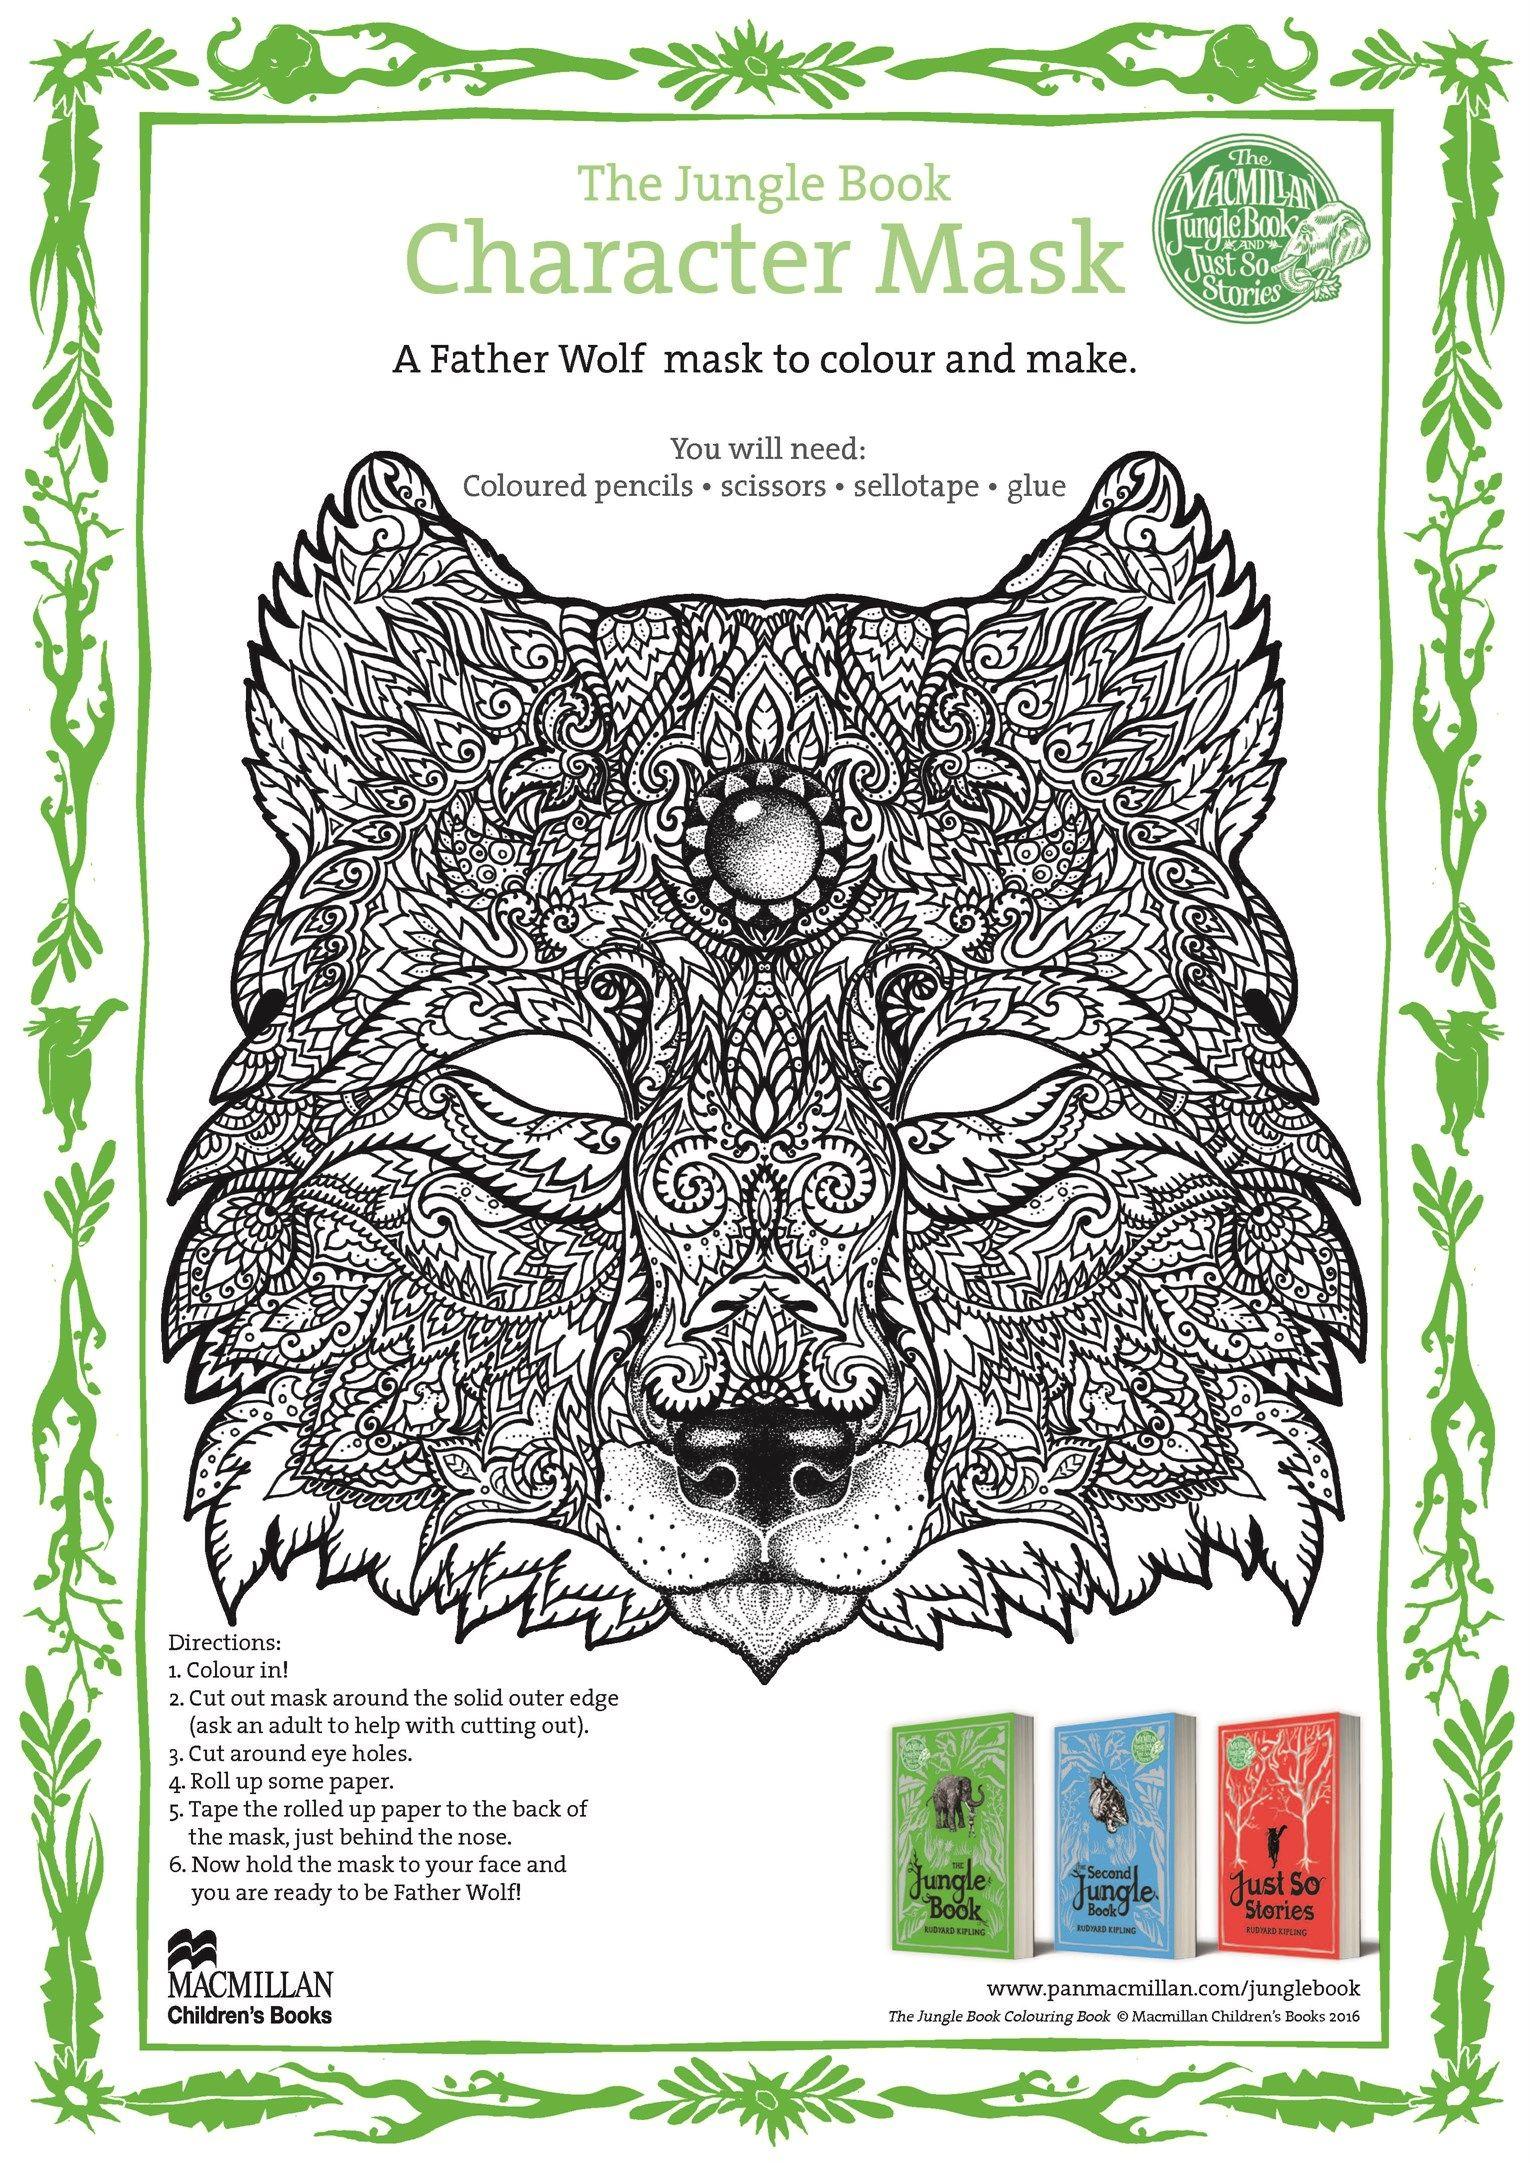 Cubs | Macmillan Publishers | mascaras manada | Pinterest | Mascaras ...